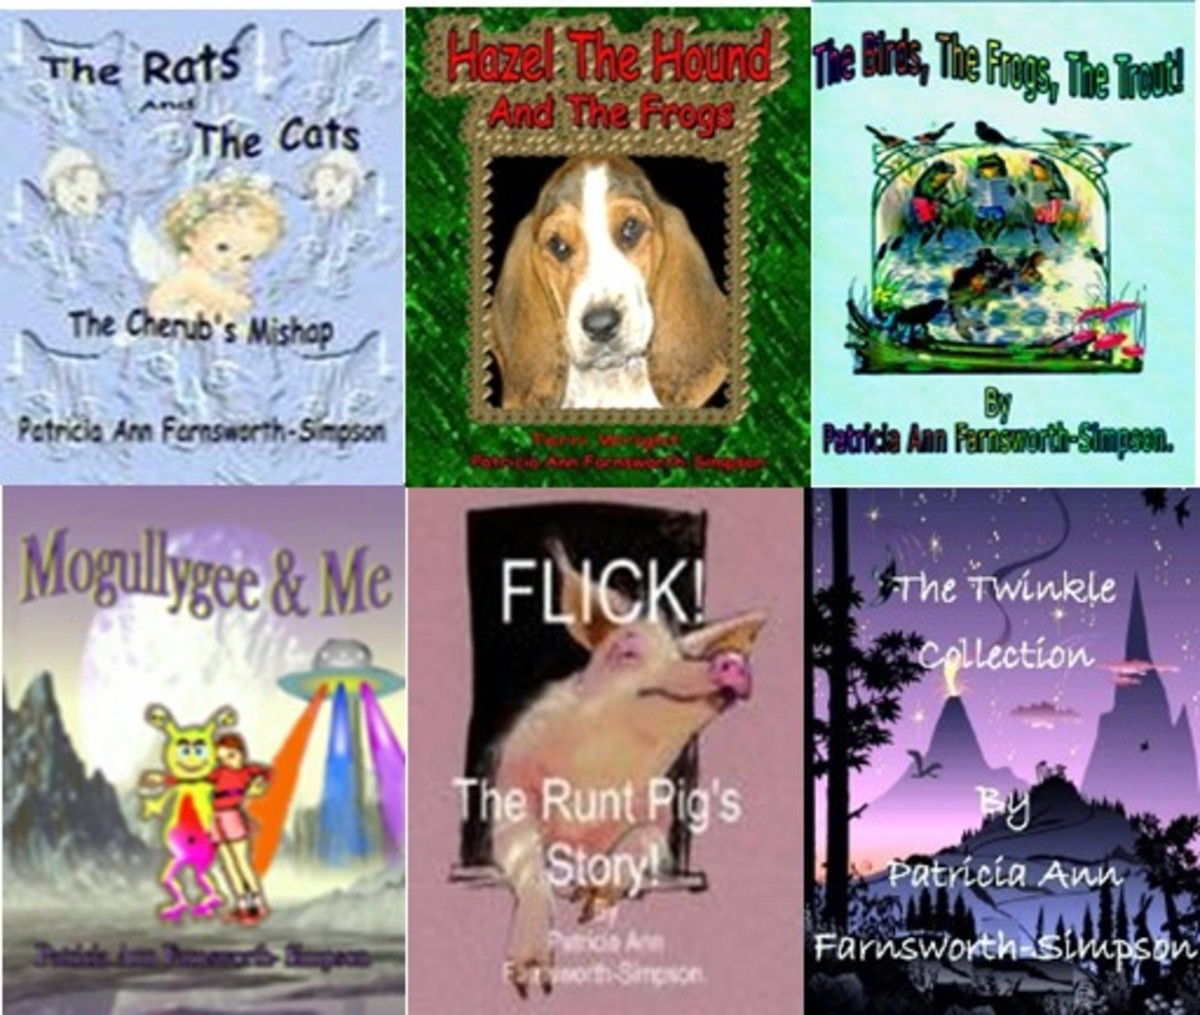 More of my Kids books